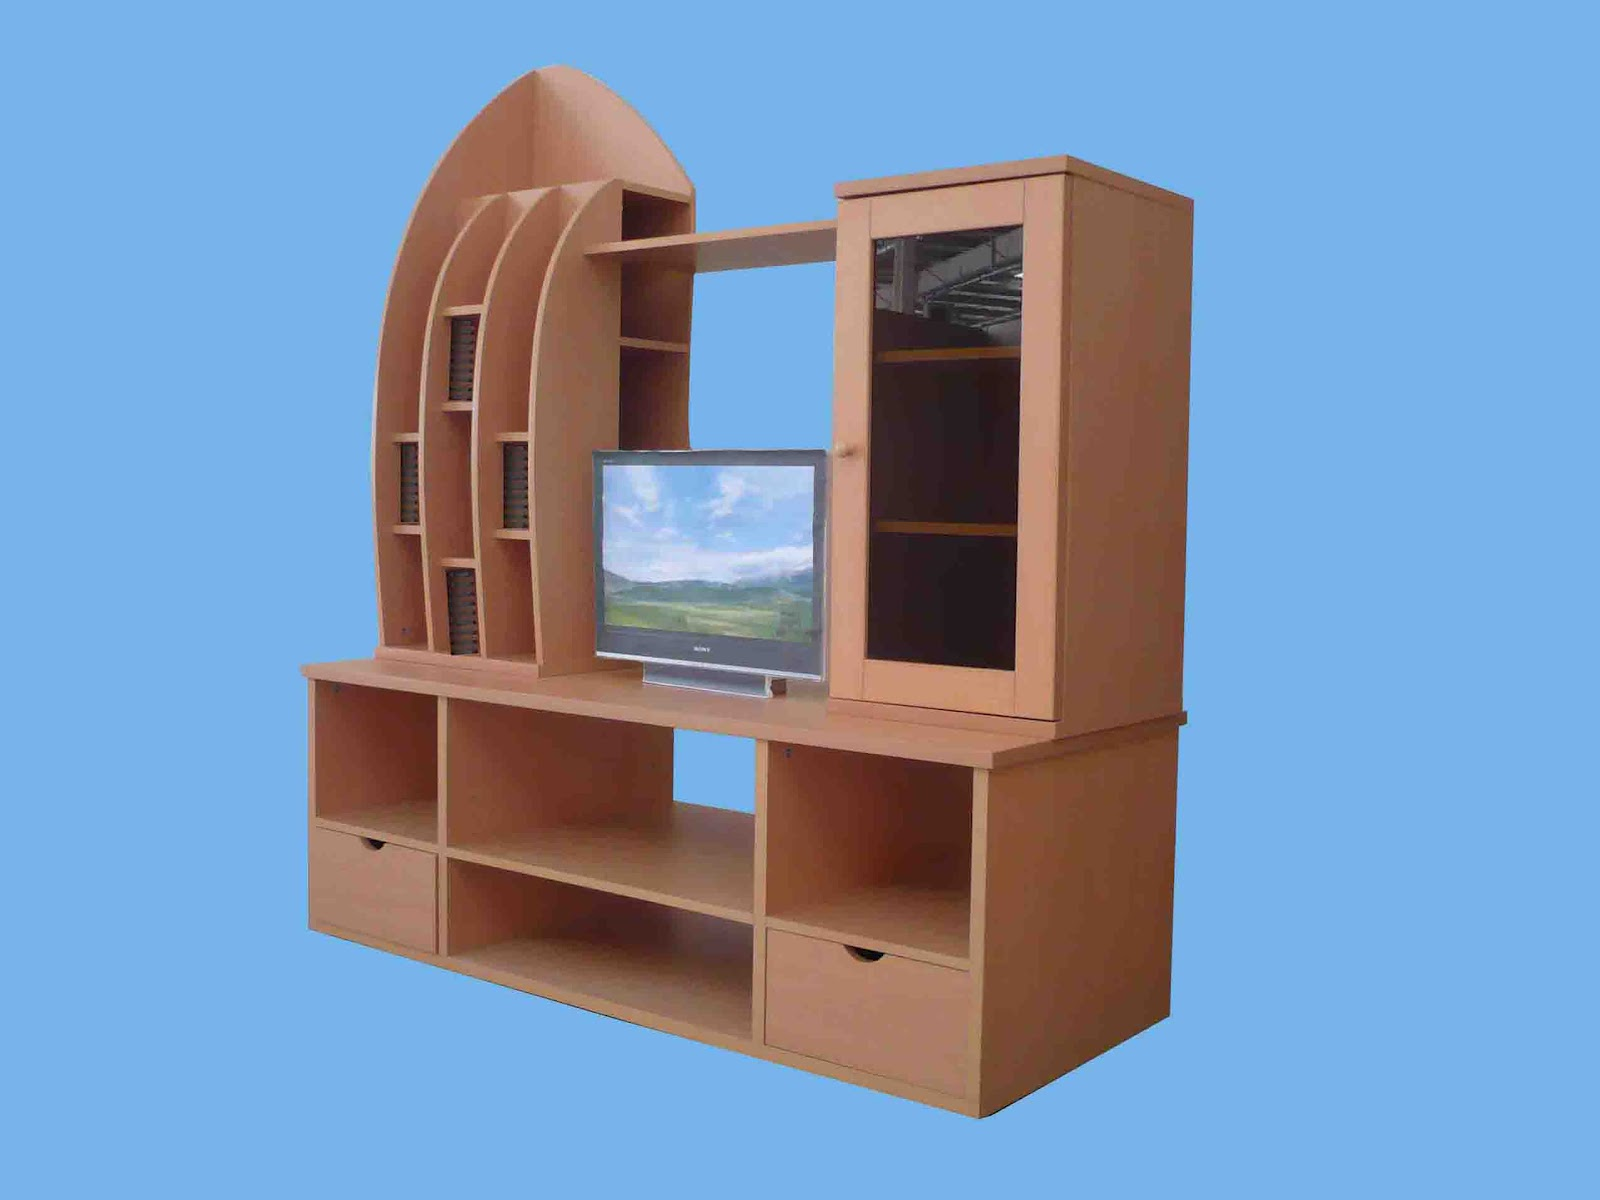 Lcd tv furnitures designs ideas an interior design - Lcd tv cabinet designs ...